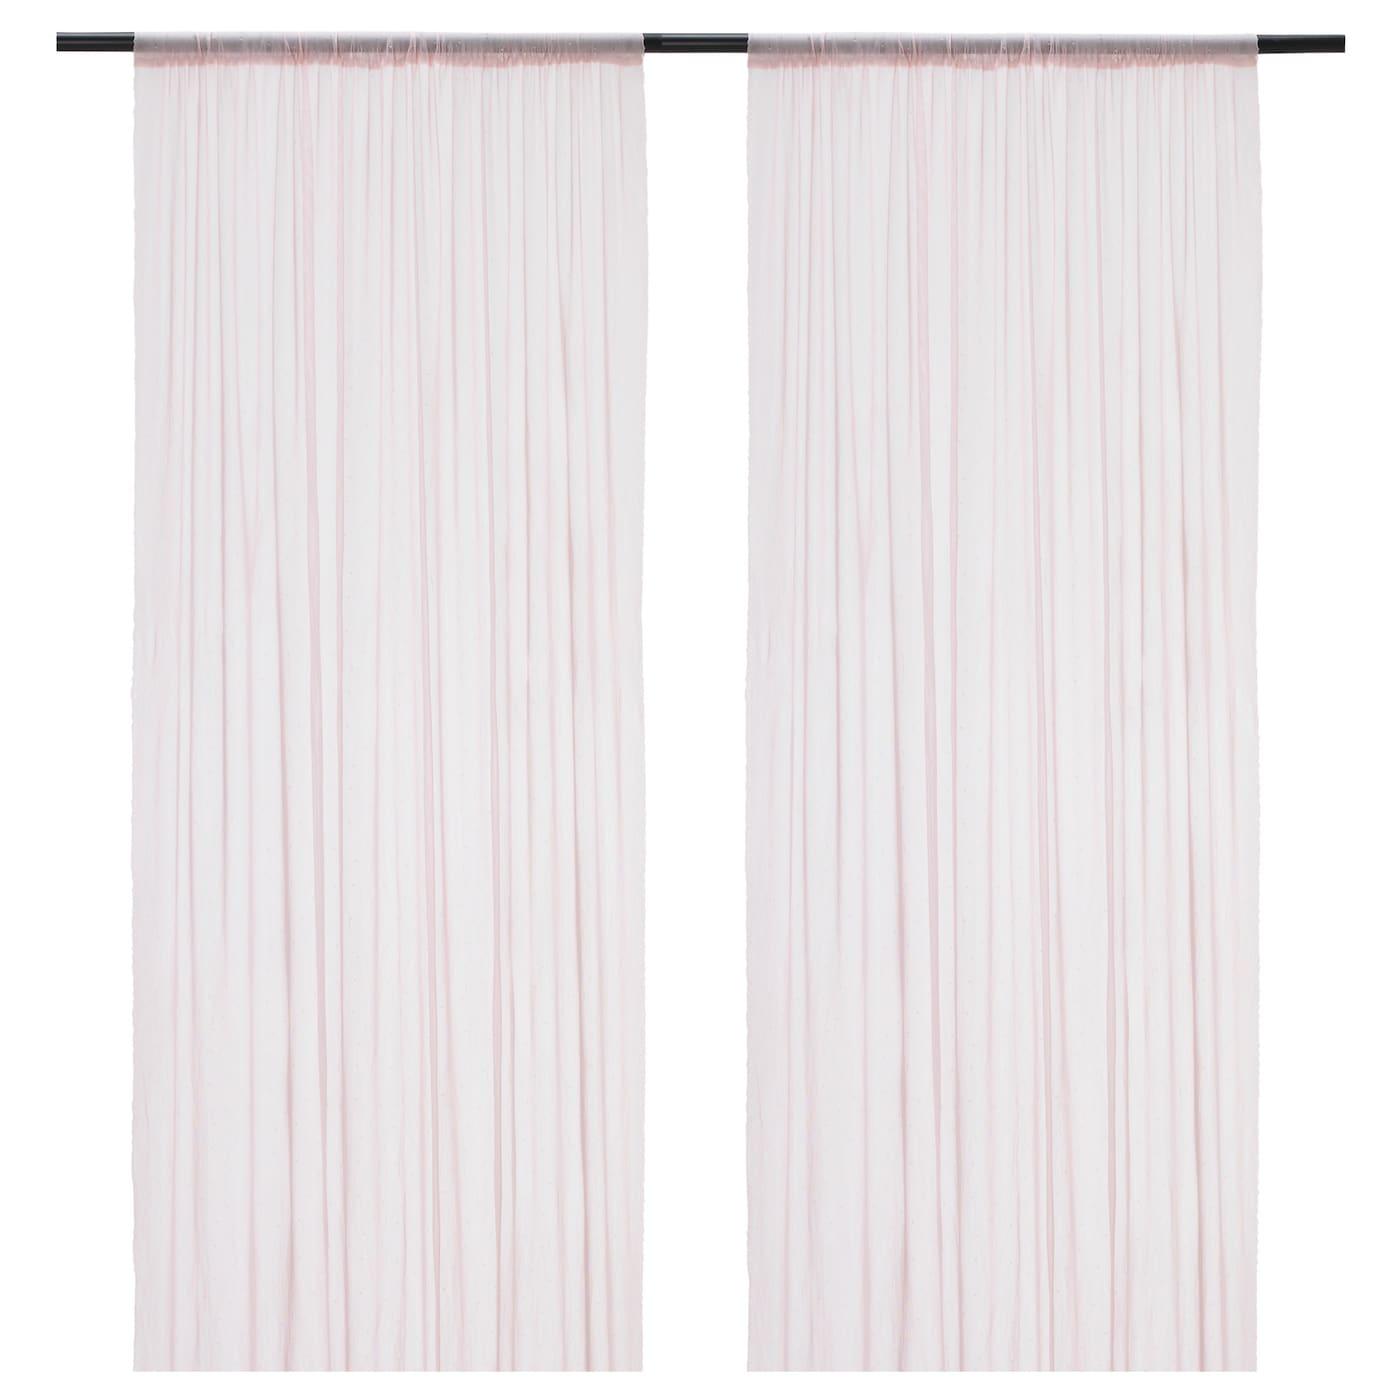 hildrun voilage 1 paire rose pois 145x300 cm ikea. Black Bedroom Furniture Sets. Home Design Ideas